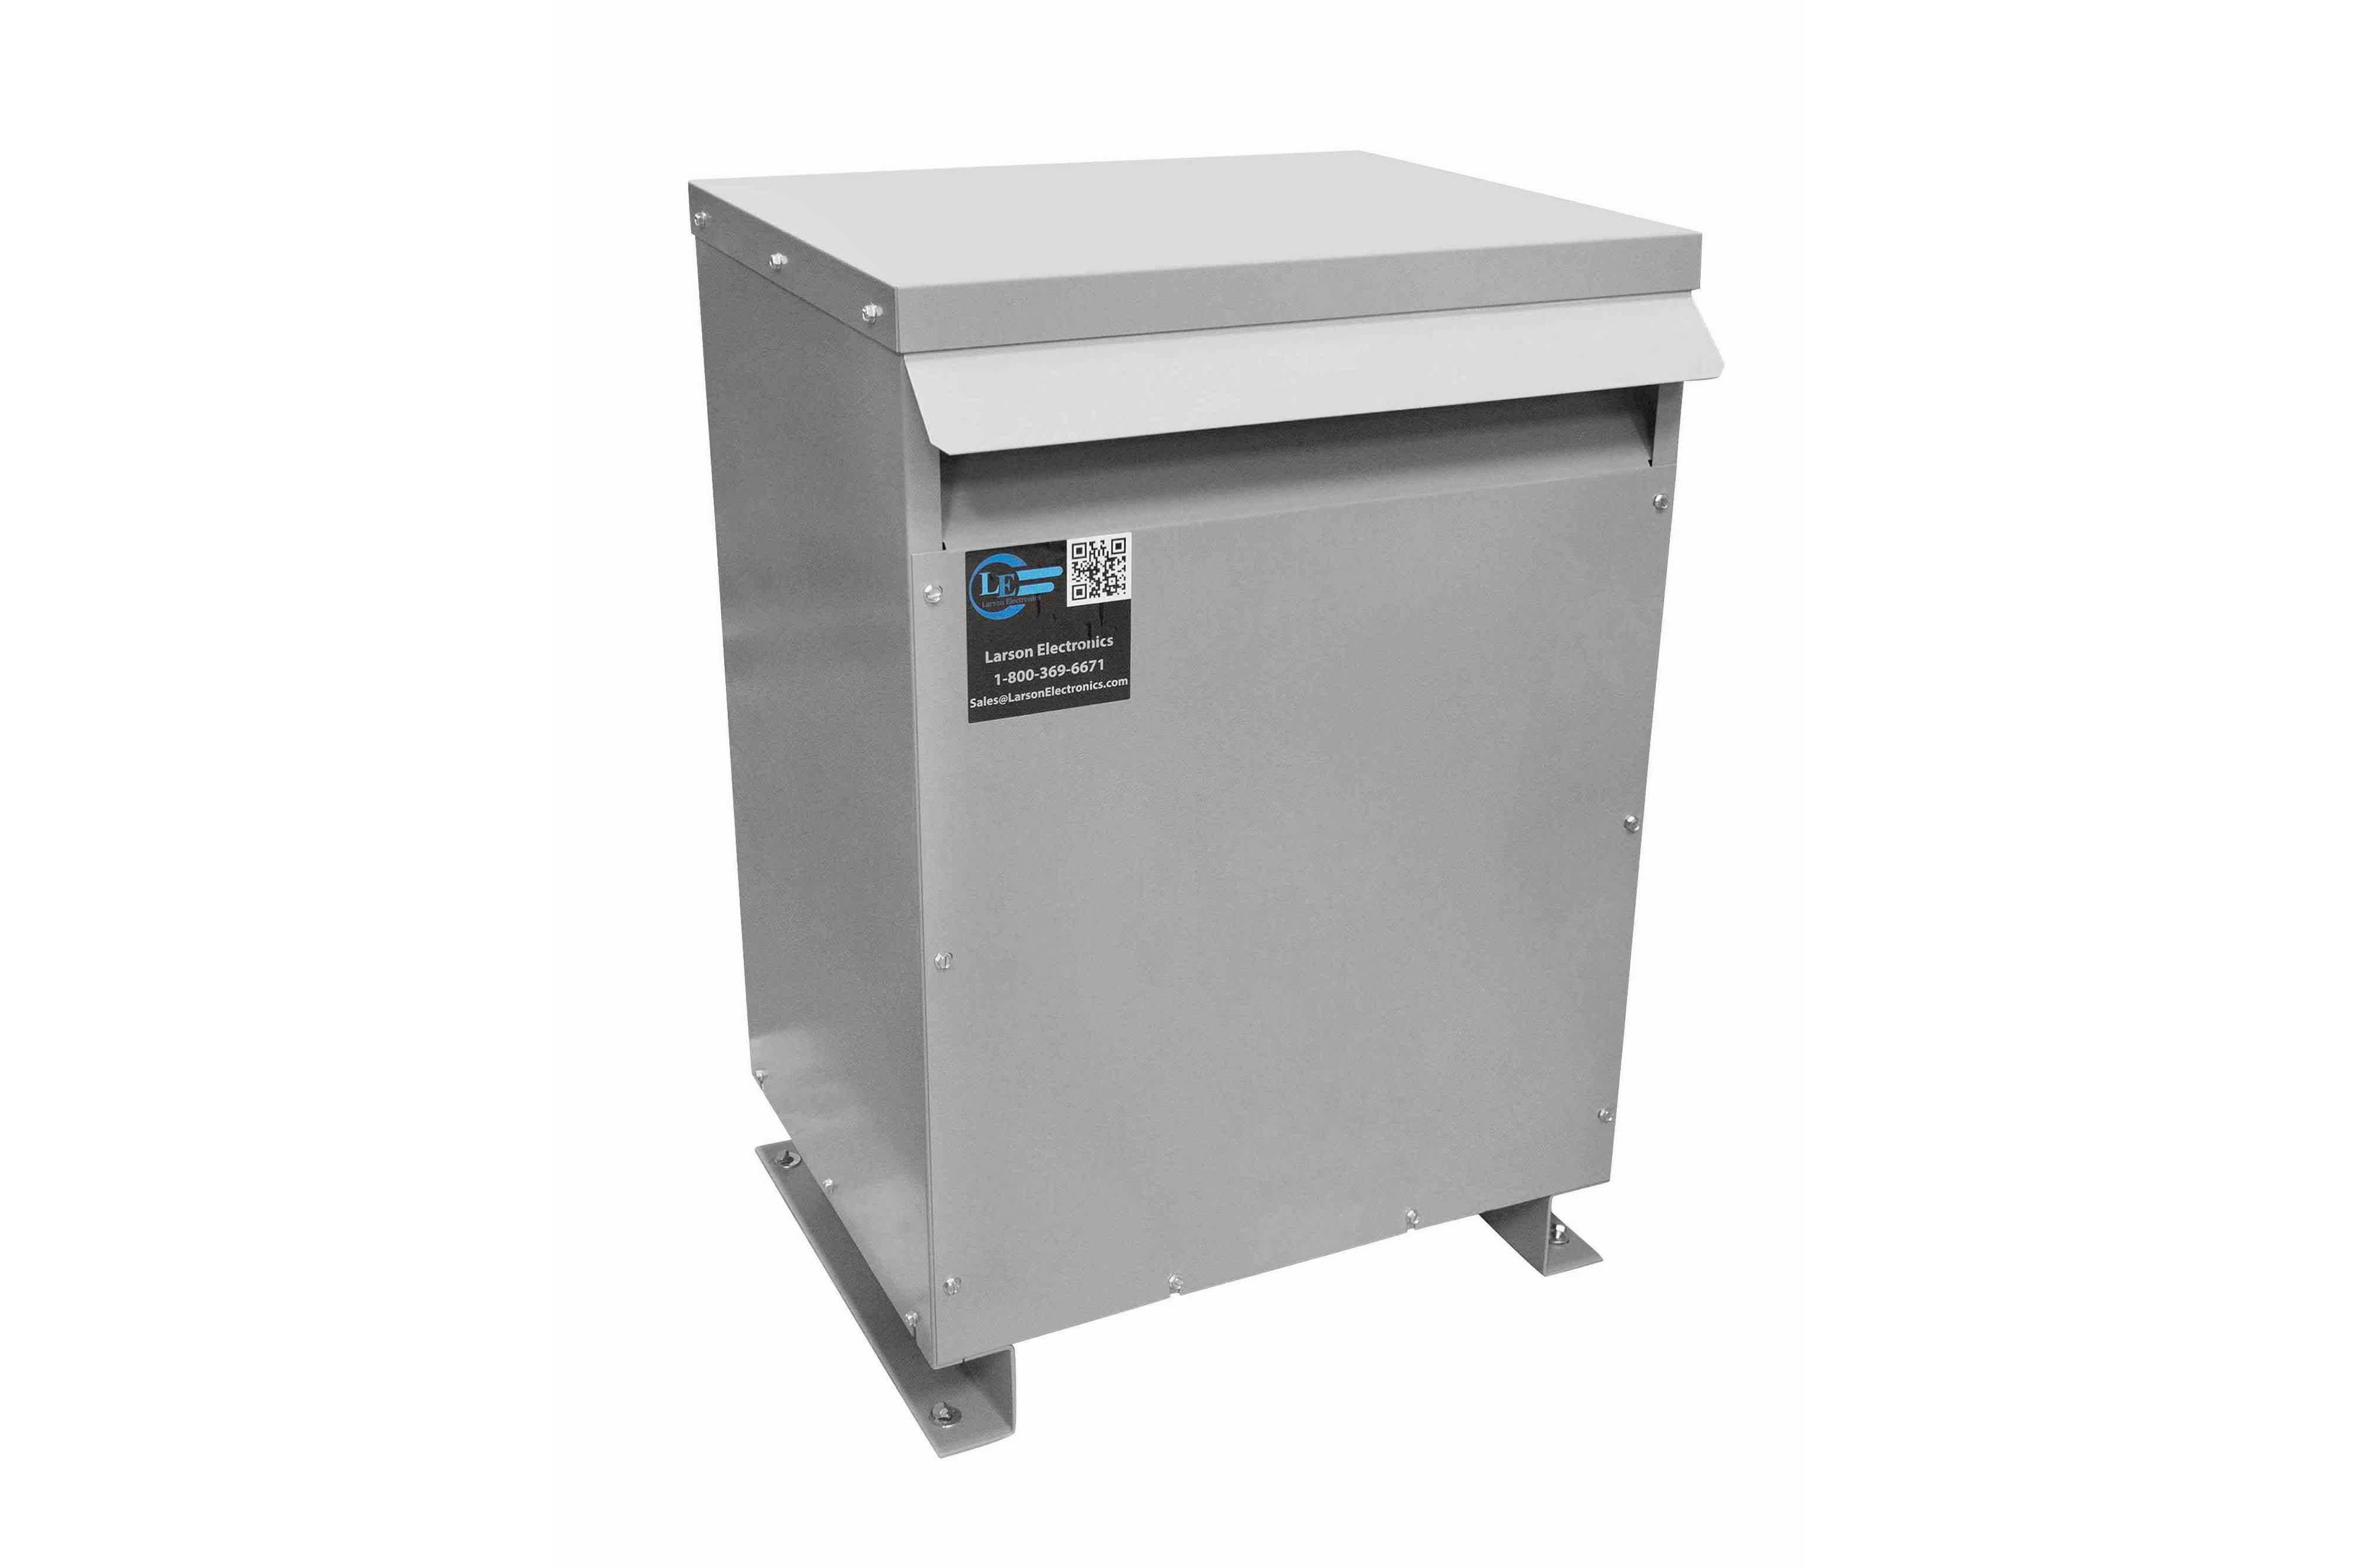 52.5 kVA 3PH Isolation Transformer, 220V Wye Primary, 208V Delta Secondary, N3R, Ventilated, 60 Hz